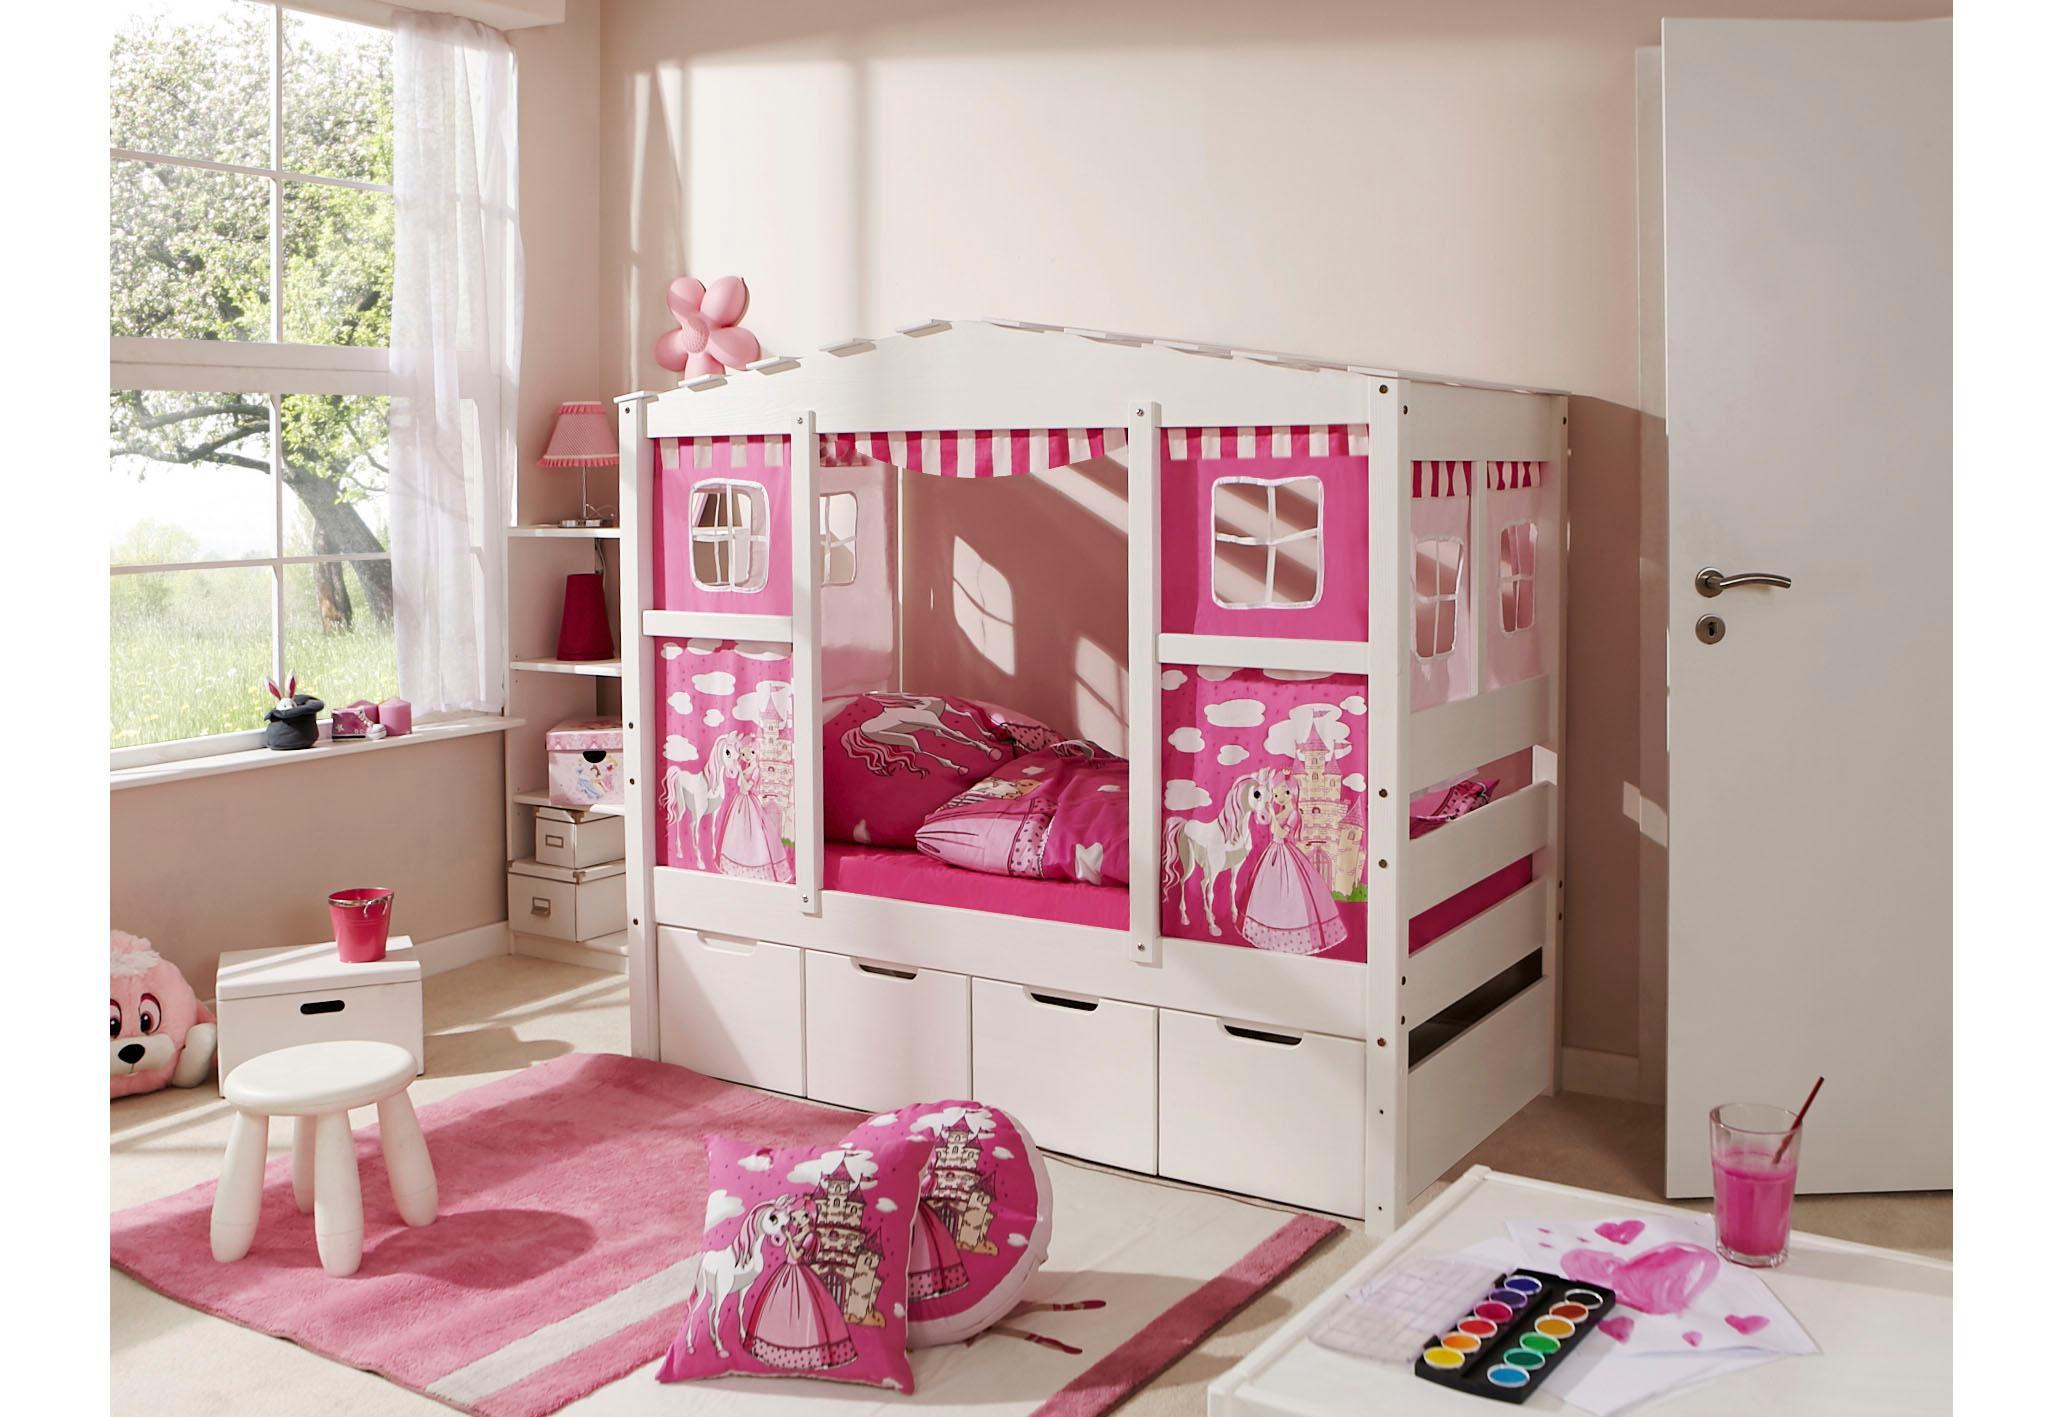 Ticaa Kinderbett in Hausoptik Lio aus massiver Kiefer Liegefläche 80x160 cm | Kinderzimmer > Kinderbetten > Kinderbetten | Textil - Kiefer | Ticaa